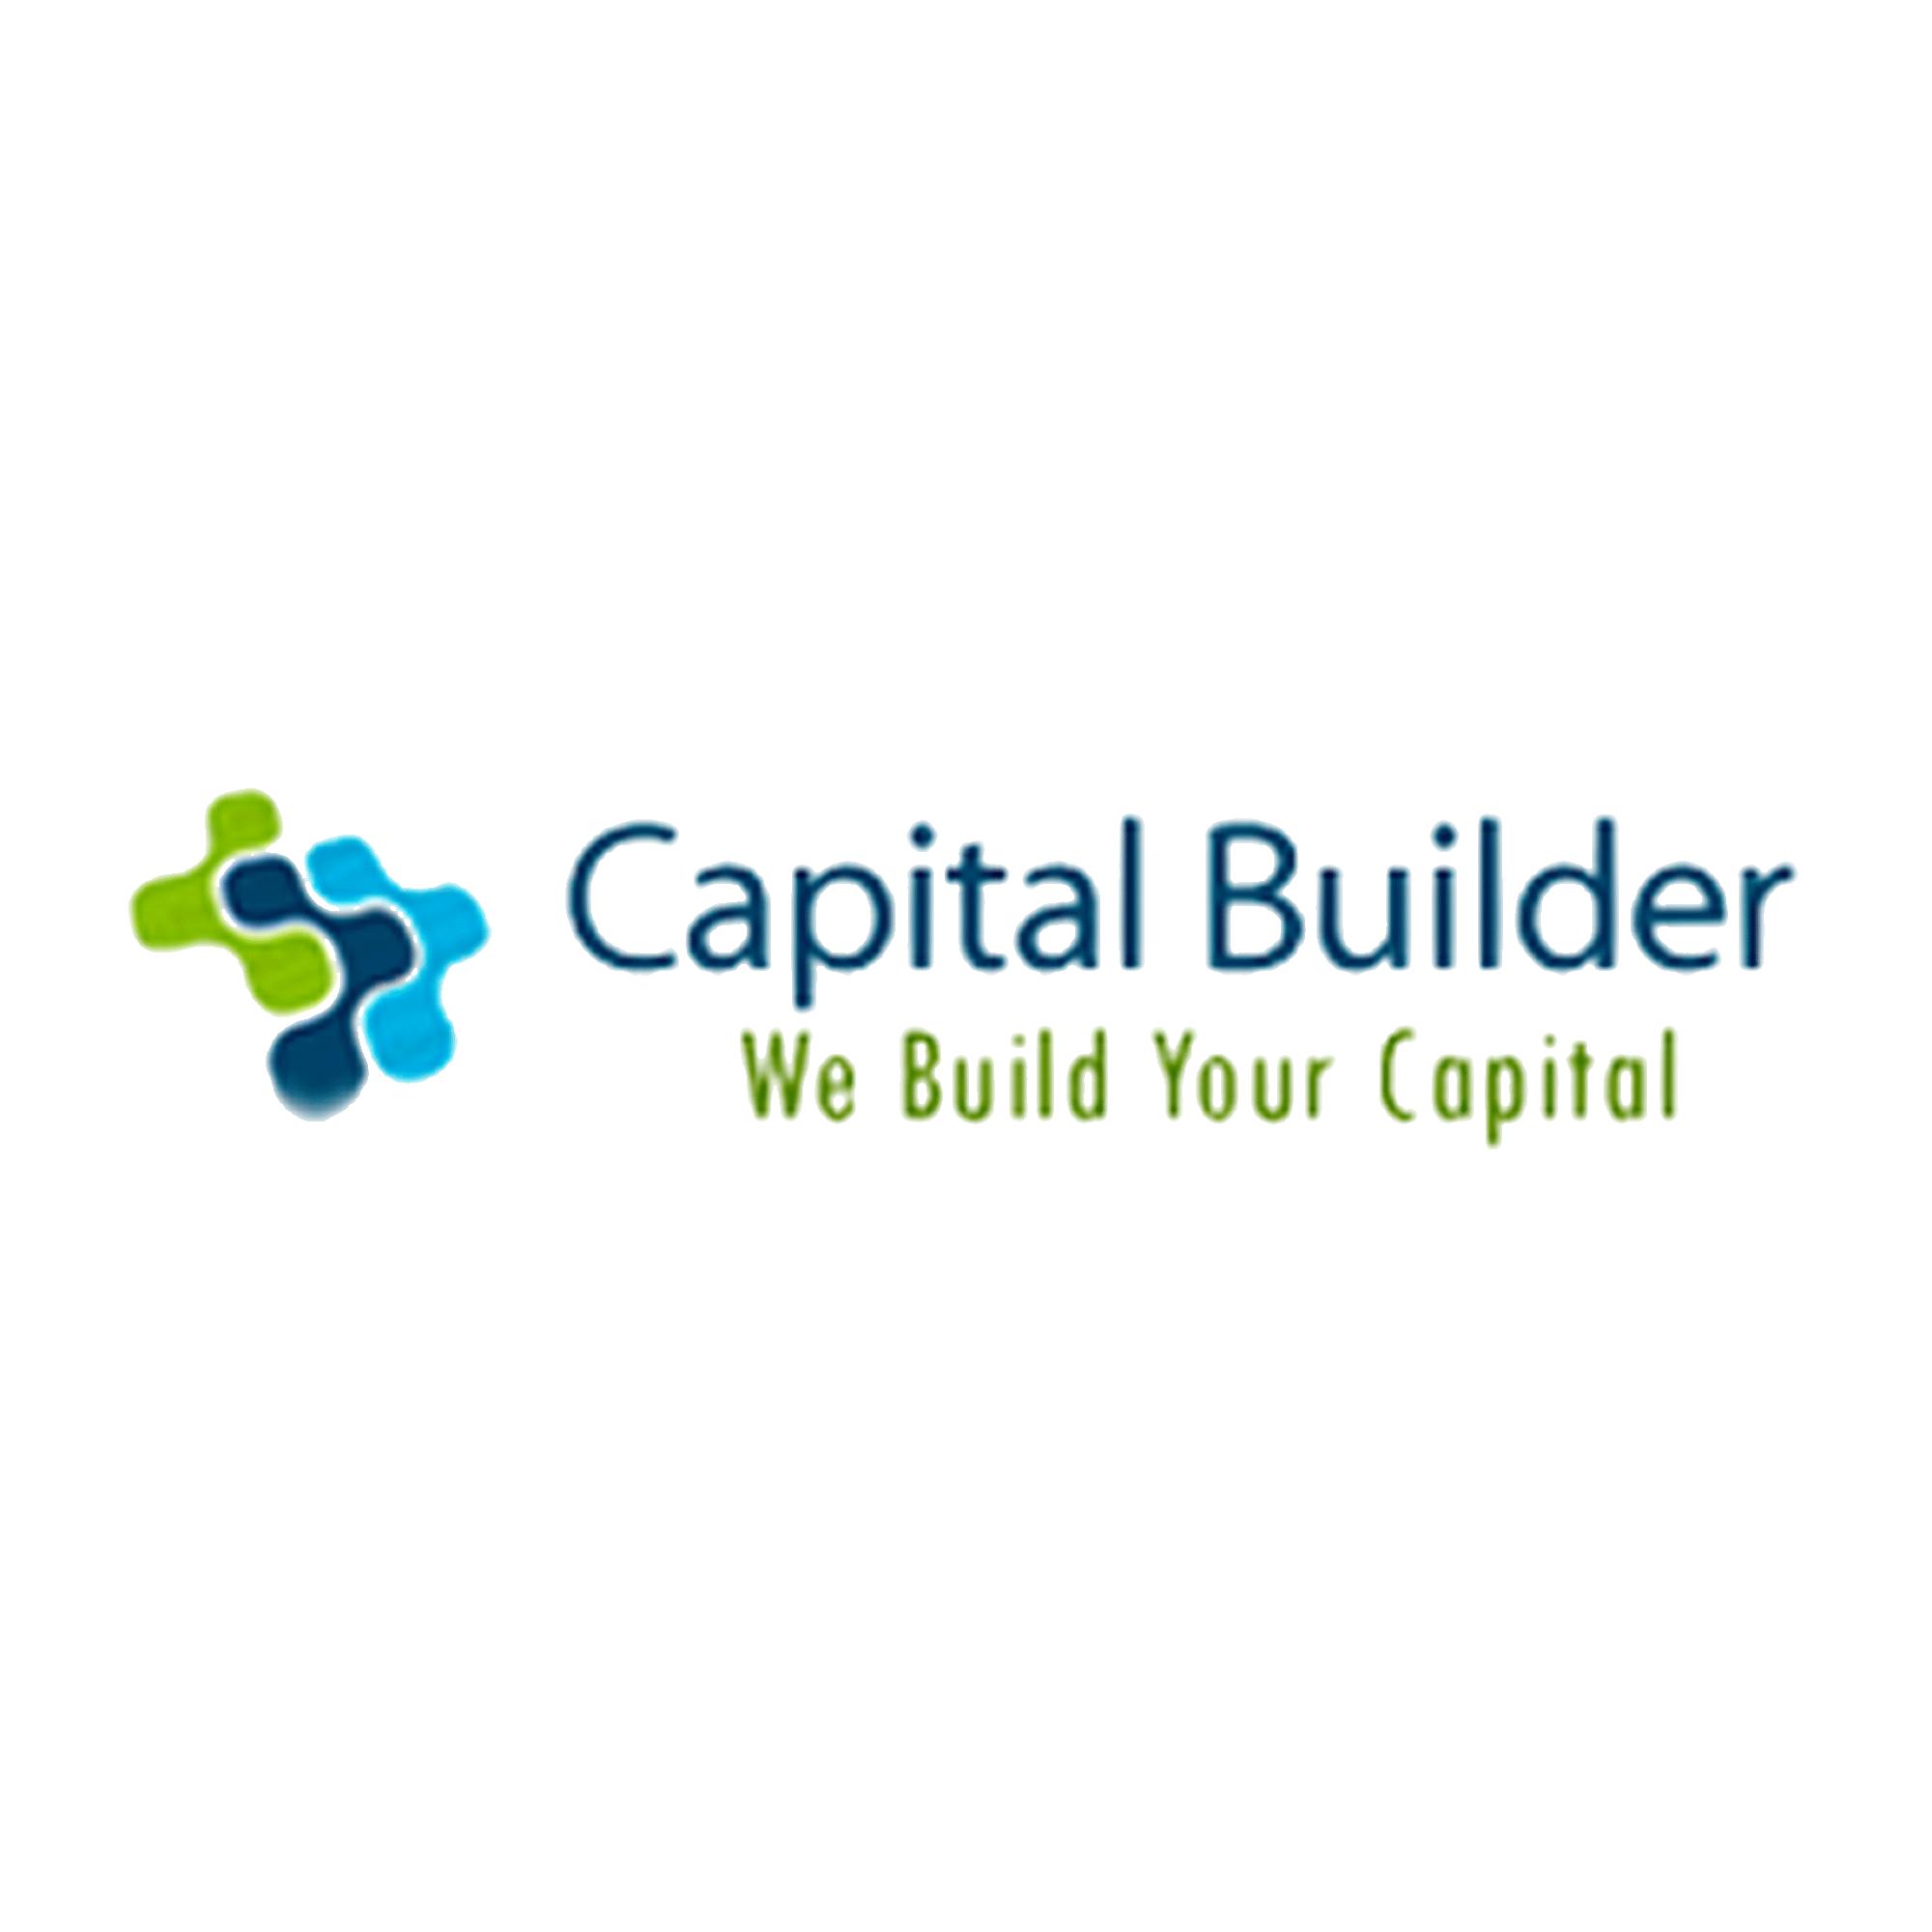 capital builder